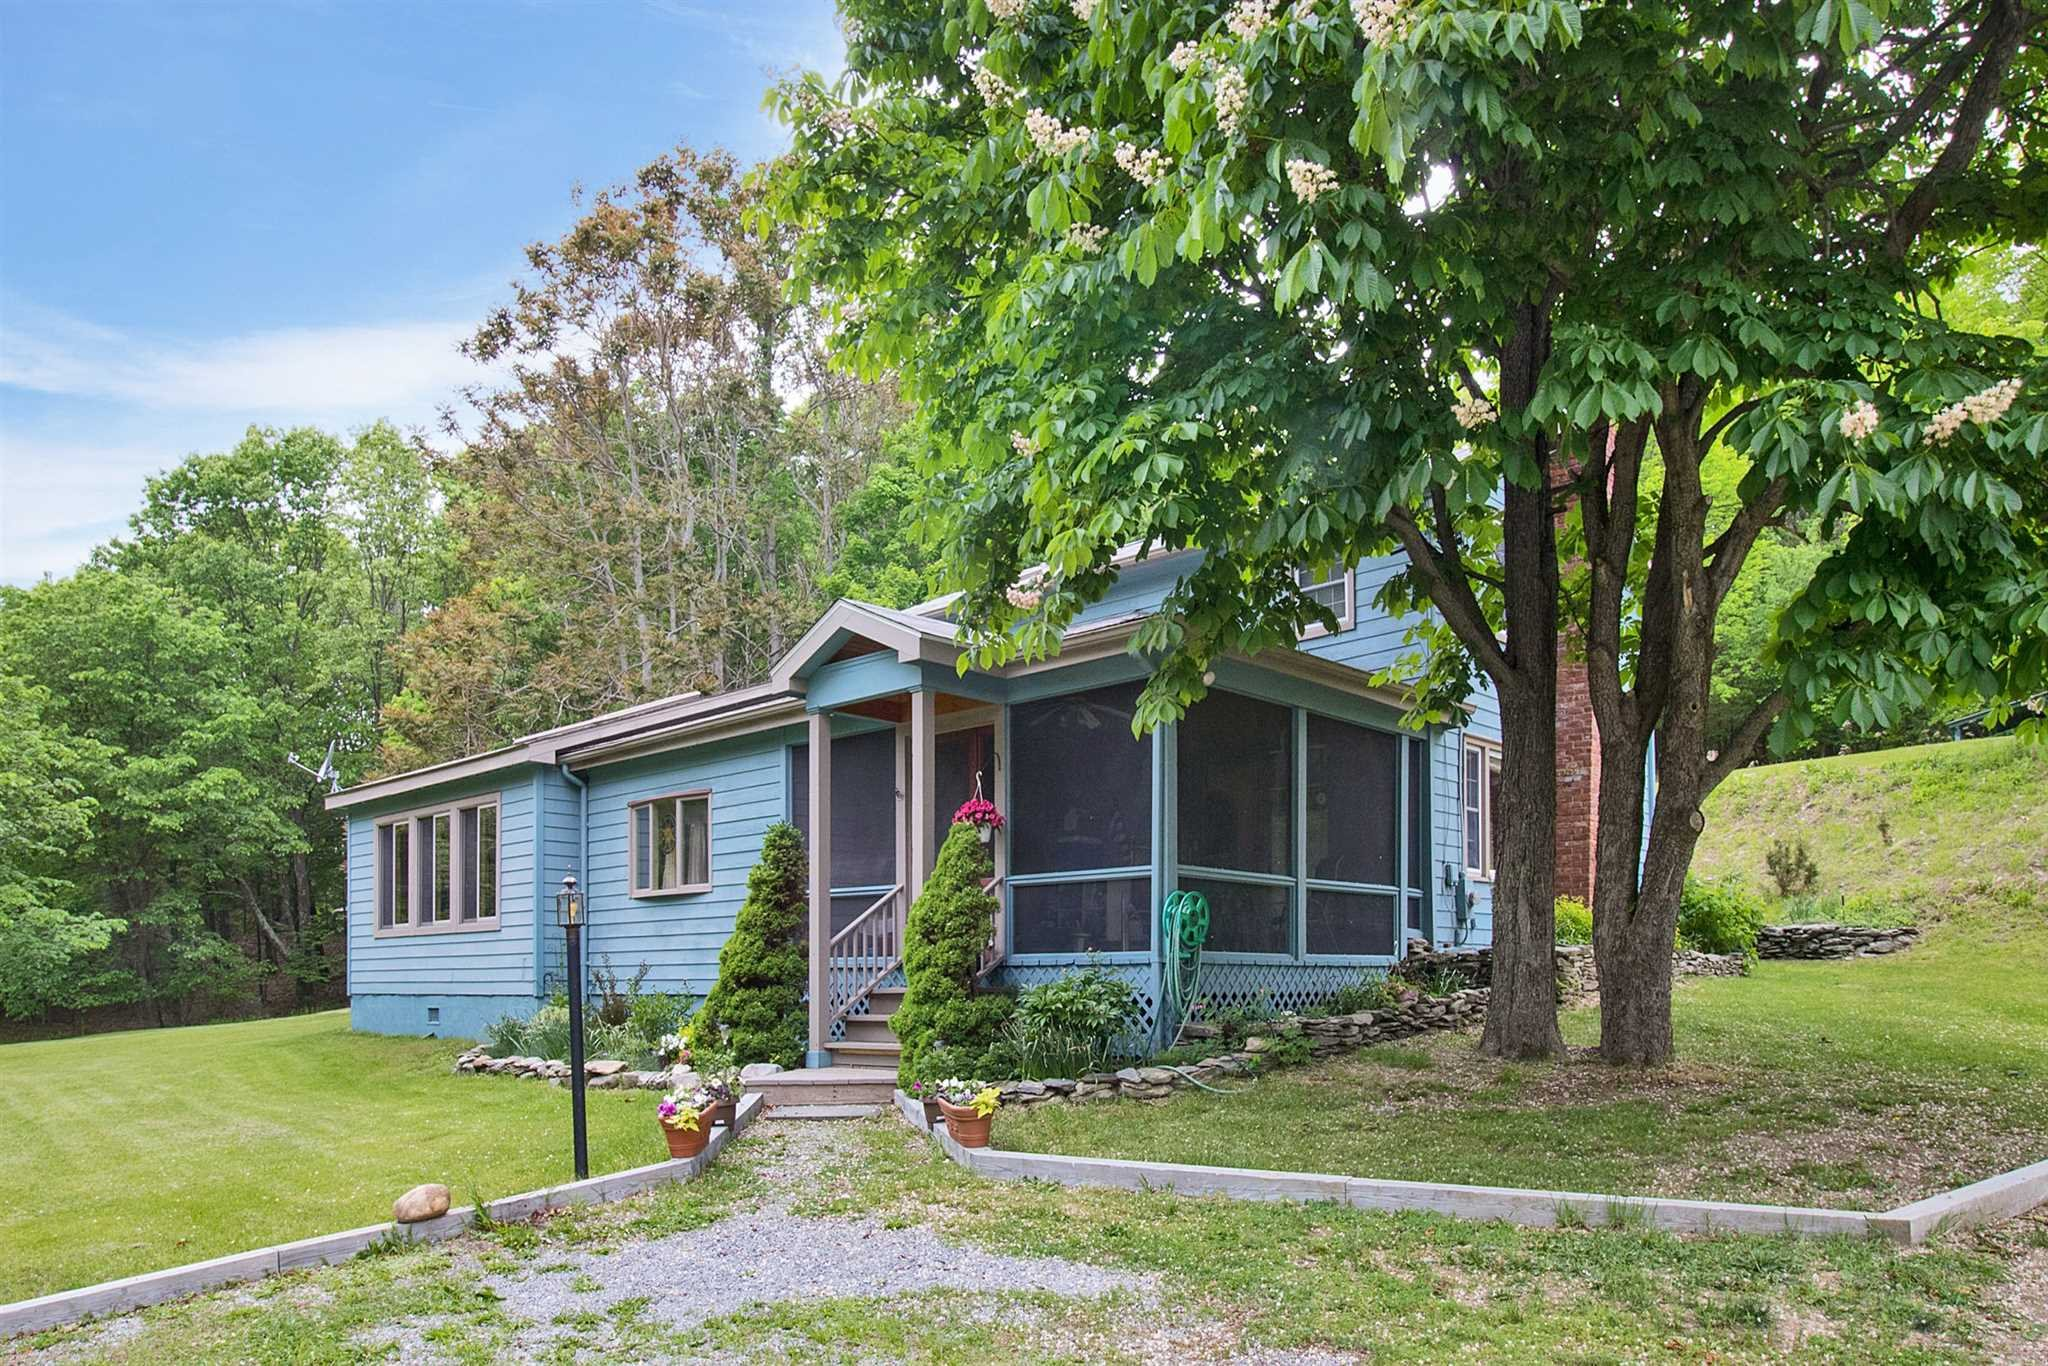 Single Family Home for Sale at 18 OLSEN Road 18 OLSEN Road Rhinebeck, New York 12572 United States